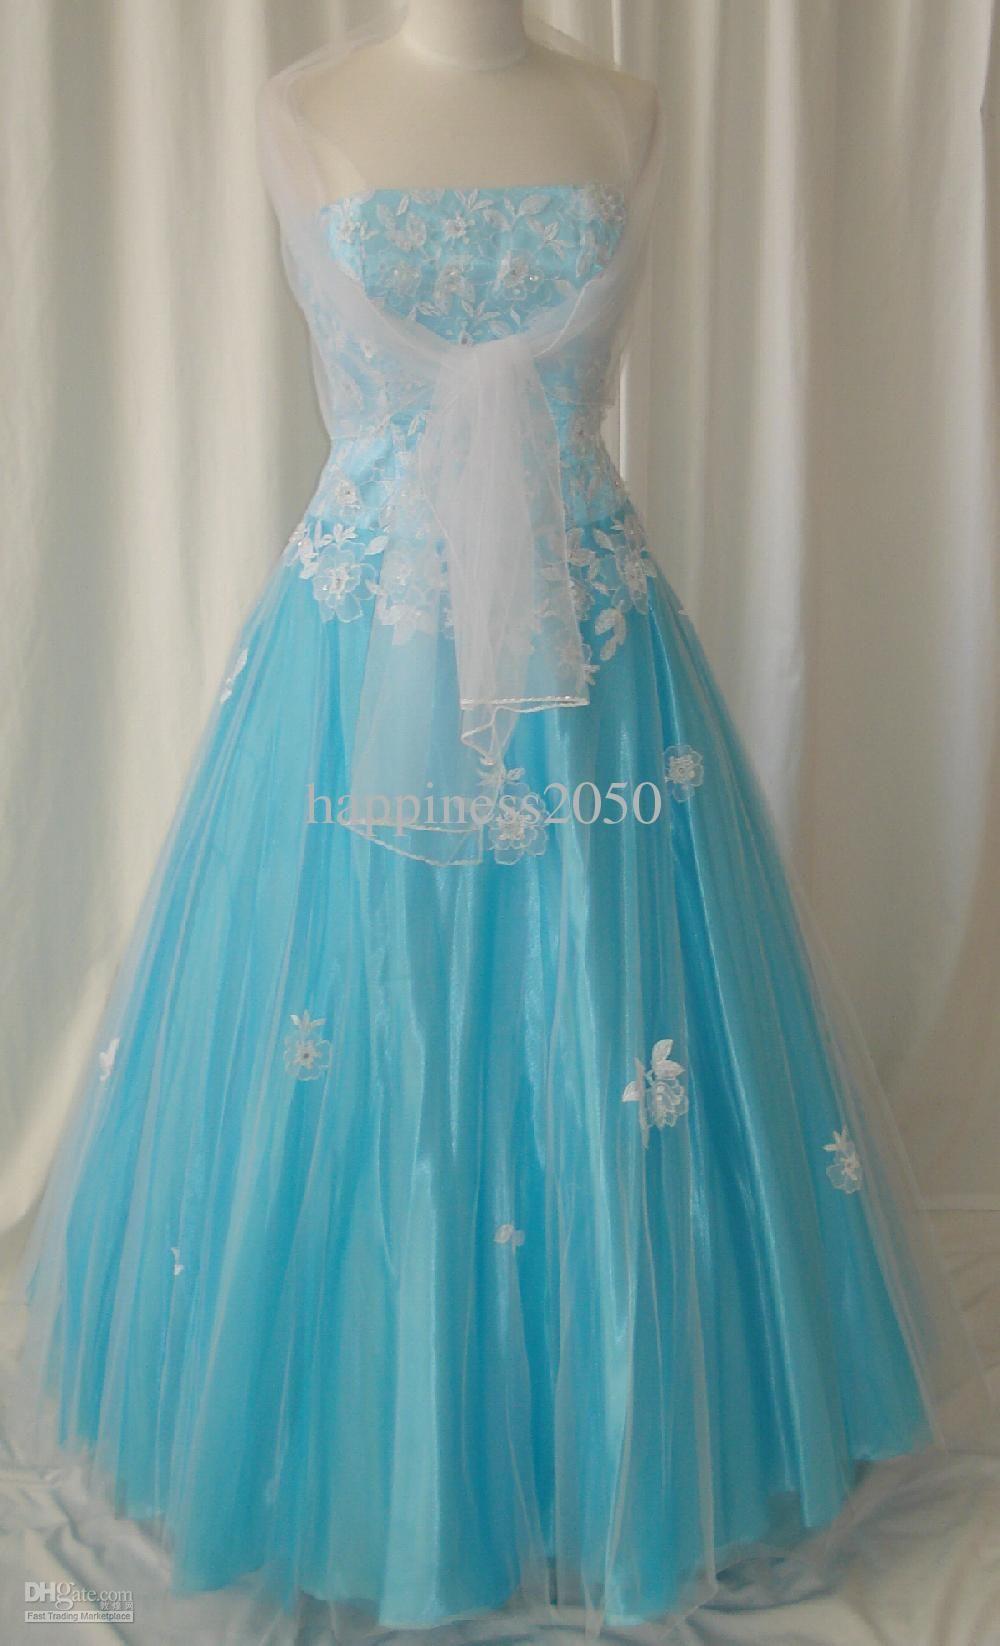 White light blue dress | Dresses | Pinterest | Pale blue dresses ...